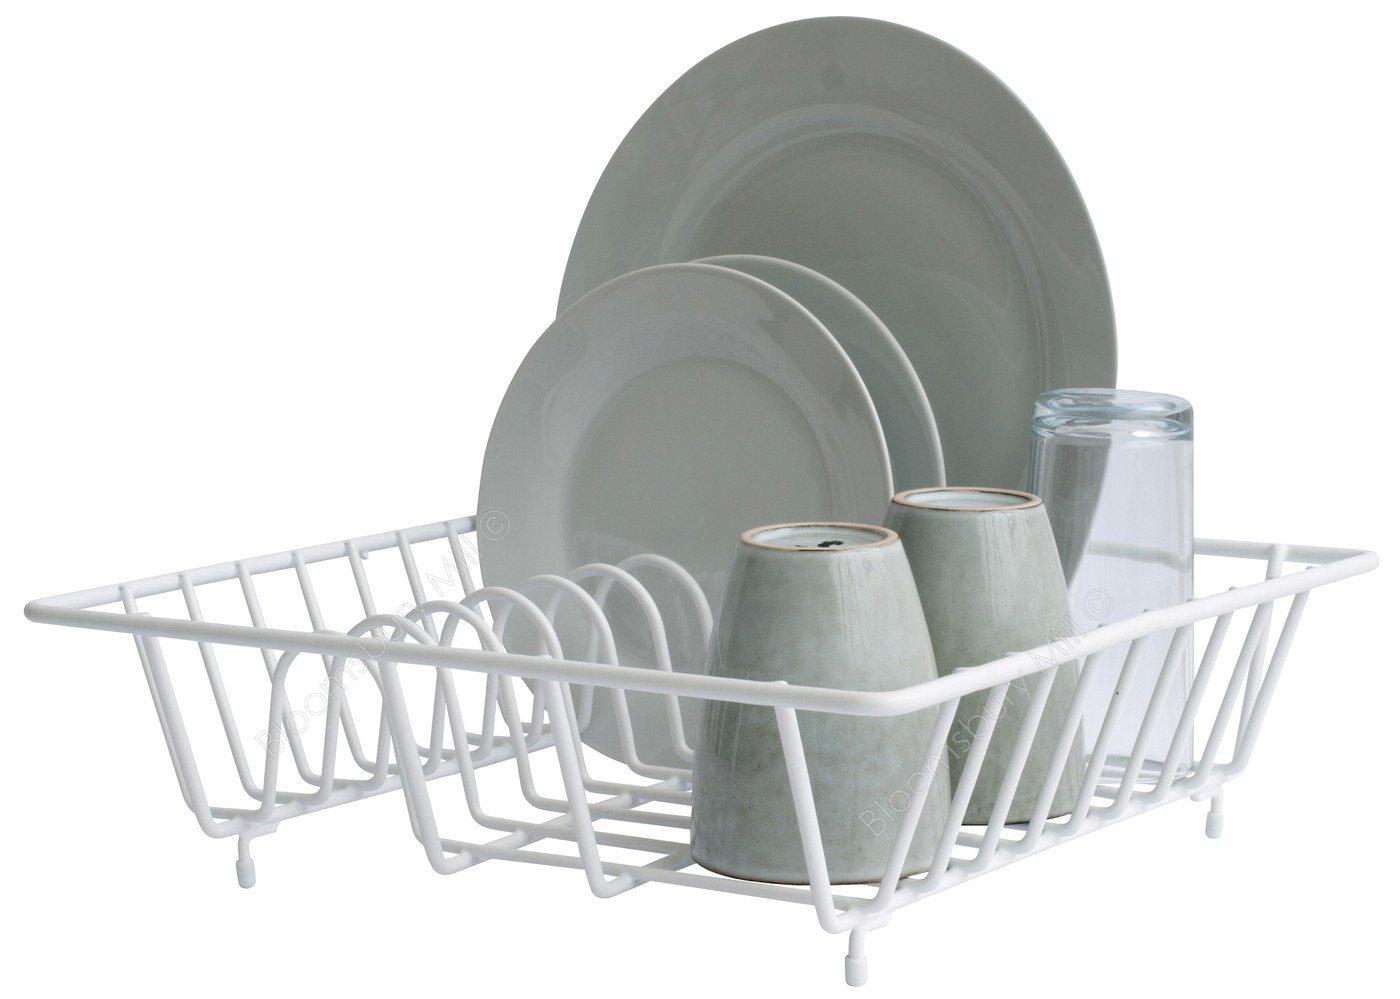 Bloomsbury Mill - Compact Dish Drainer - Plate Drying Rack - Anti-Rust - White